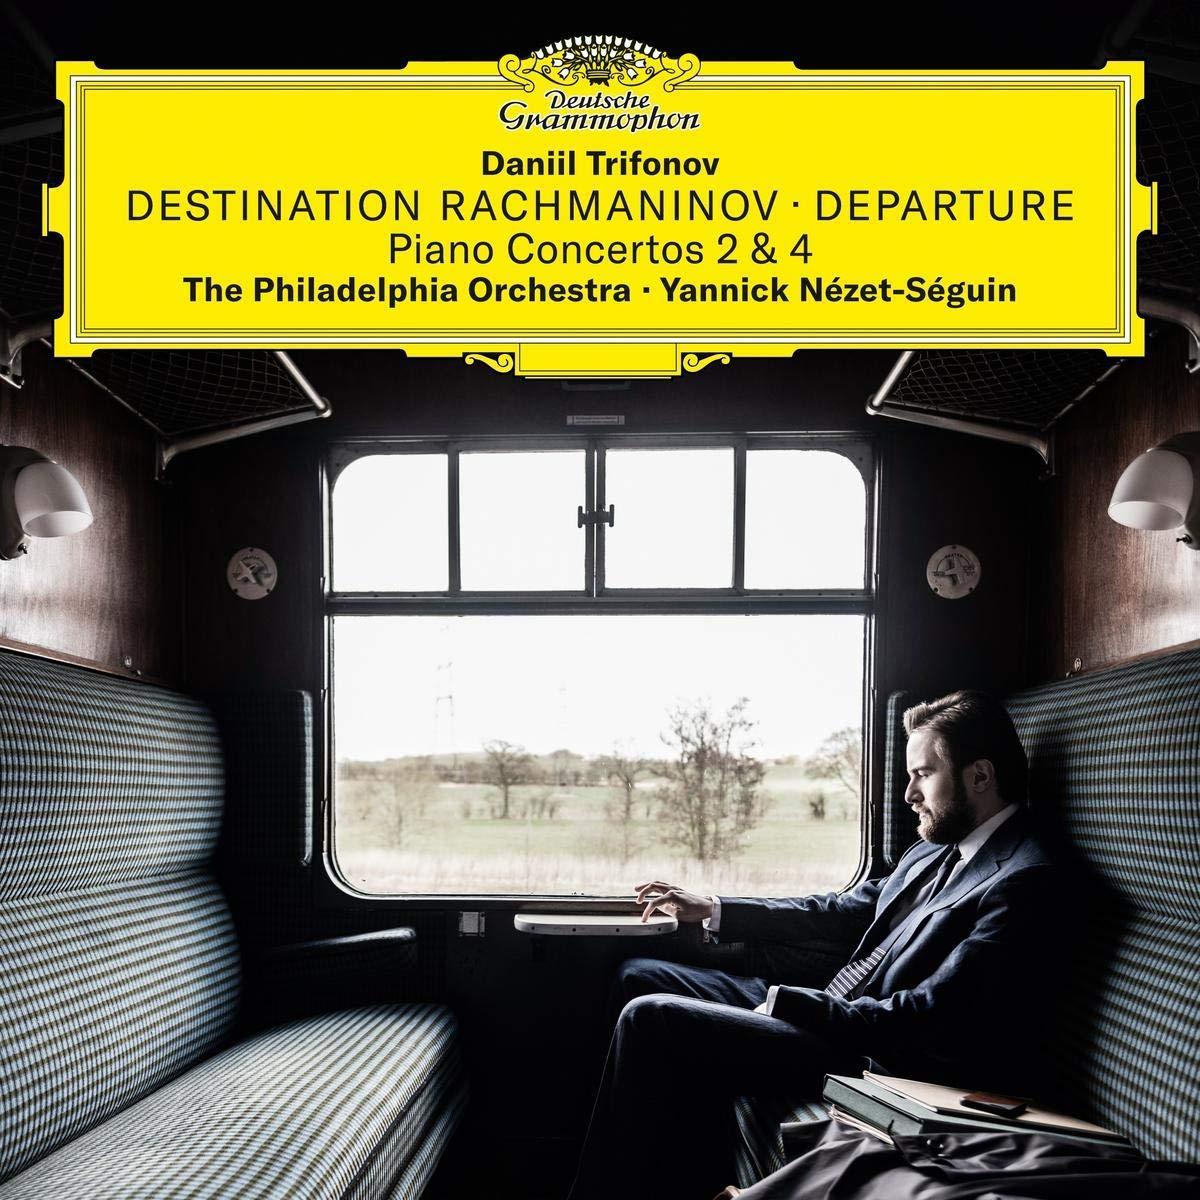 Даниил Трифонов Daniil Trifonov. Destination Rachmaninov. Departure sergey shirin education inrussia in